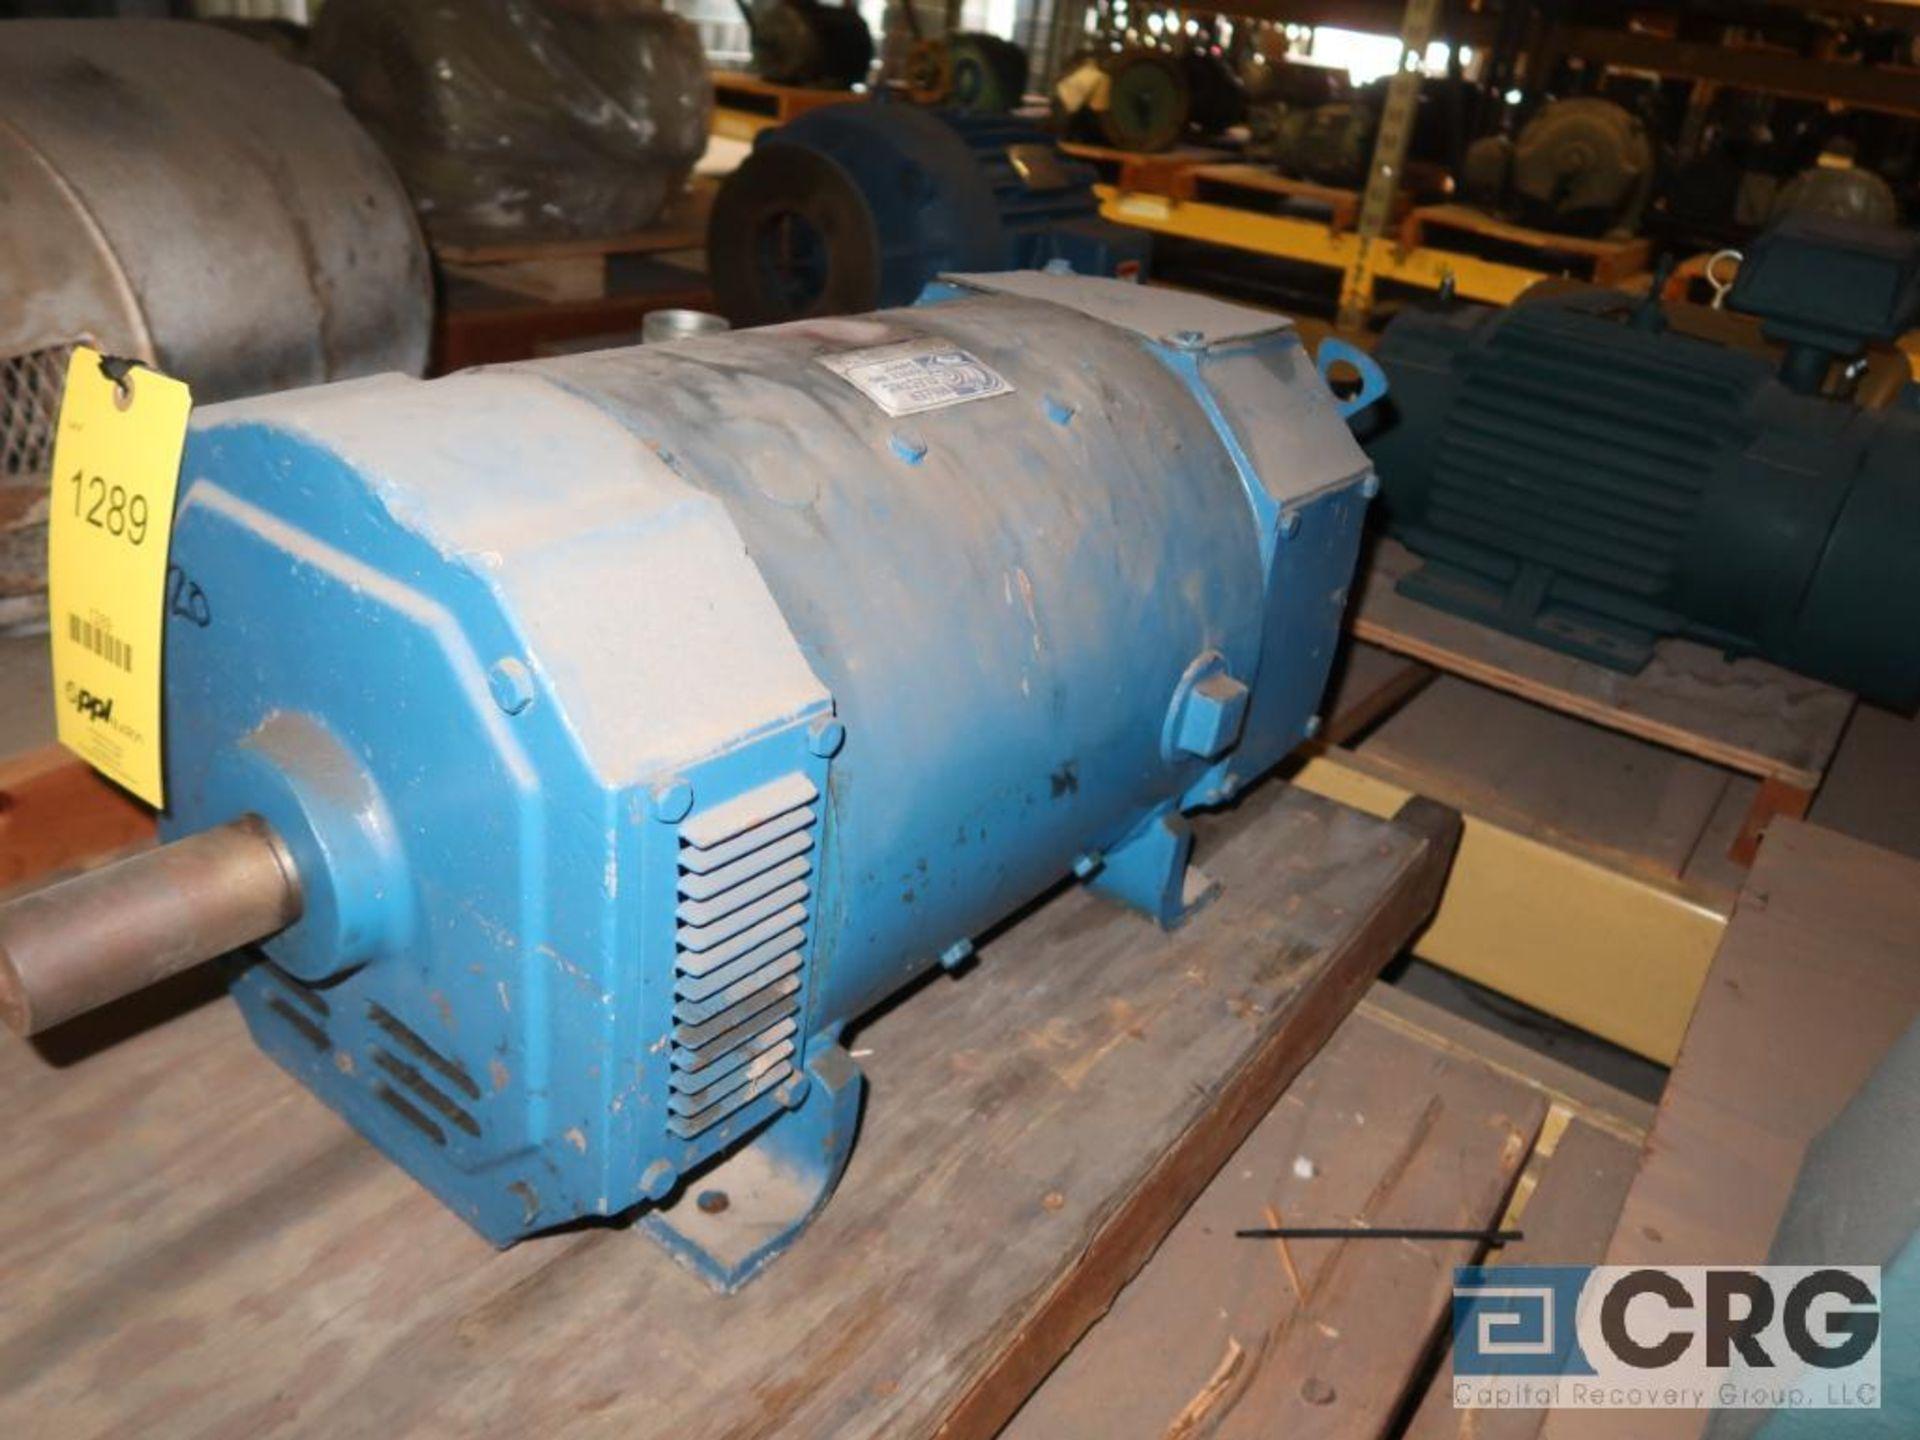 Lot of (4) assorted 20 HP motors (Motor Building) - Image 2 of 4